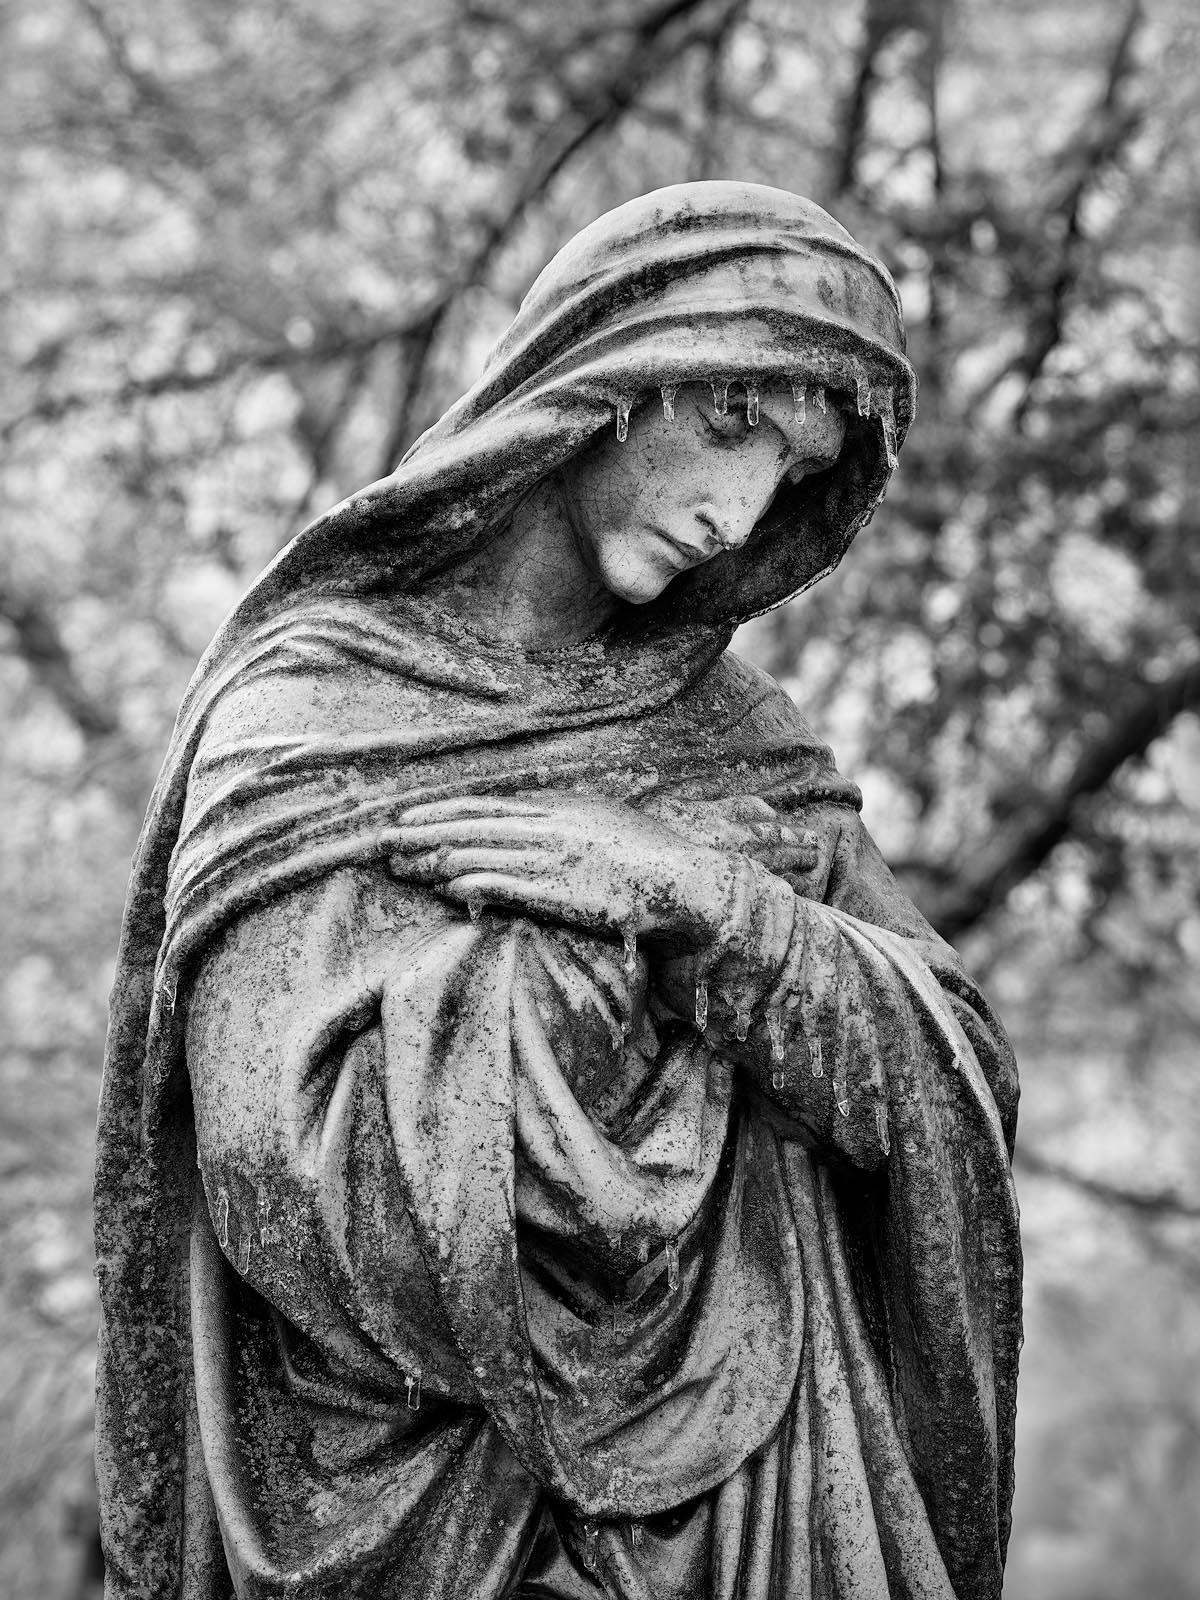 WORLD REGIONS & COUNTRIES, North America, United States of America, Missouri, St. Louis, Calvary Cemetery, IPTC-SUBJECT, 08000000...